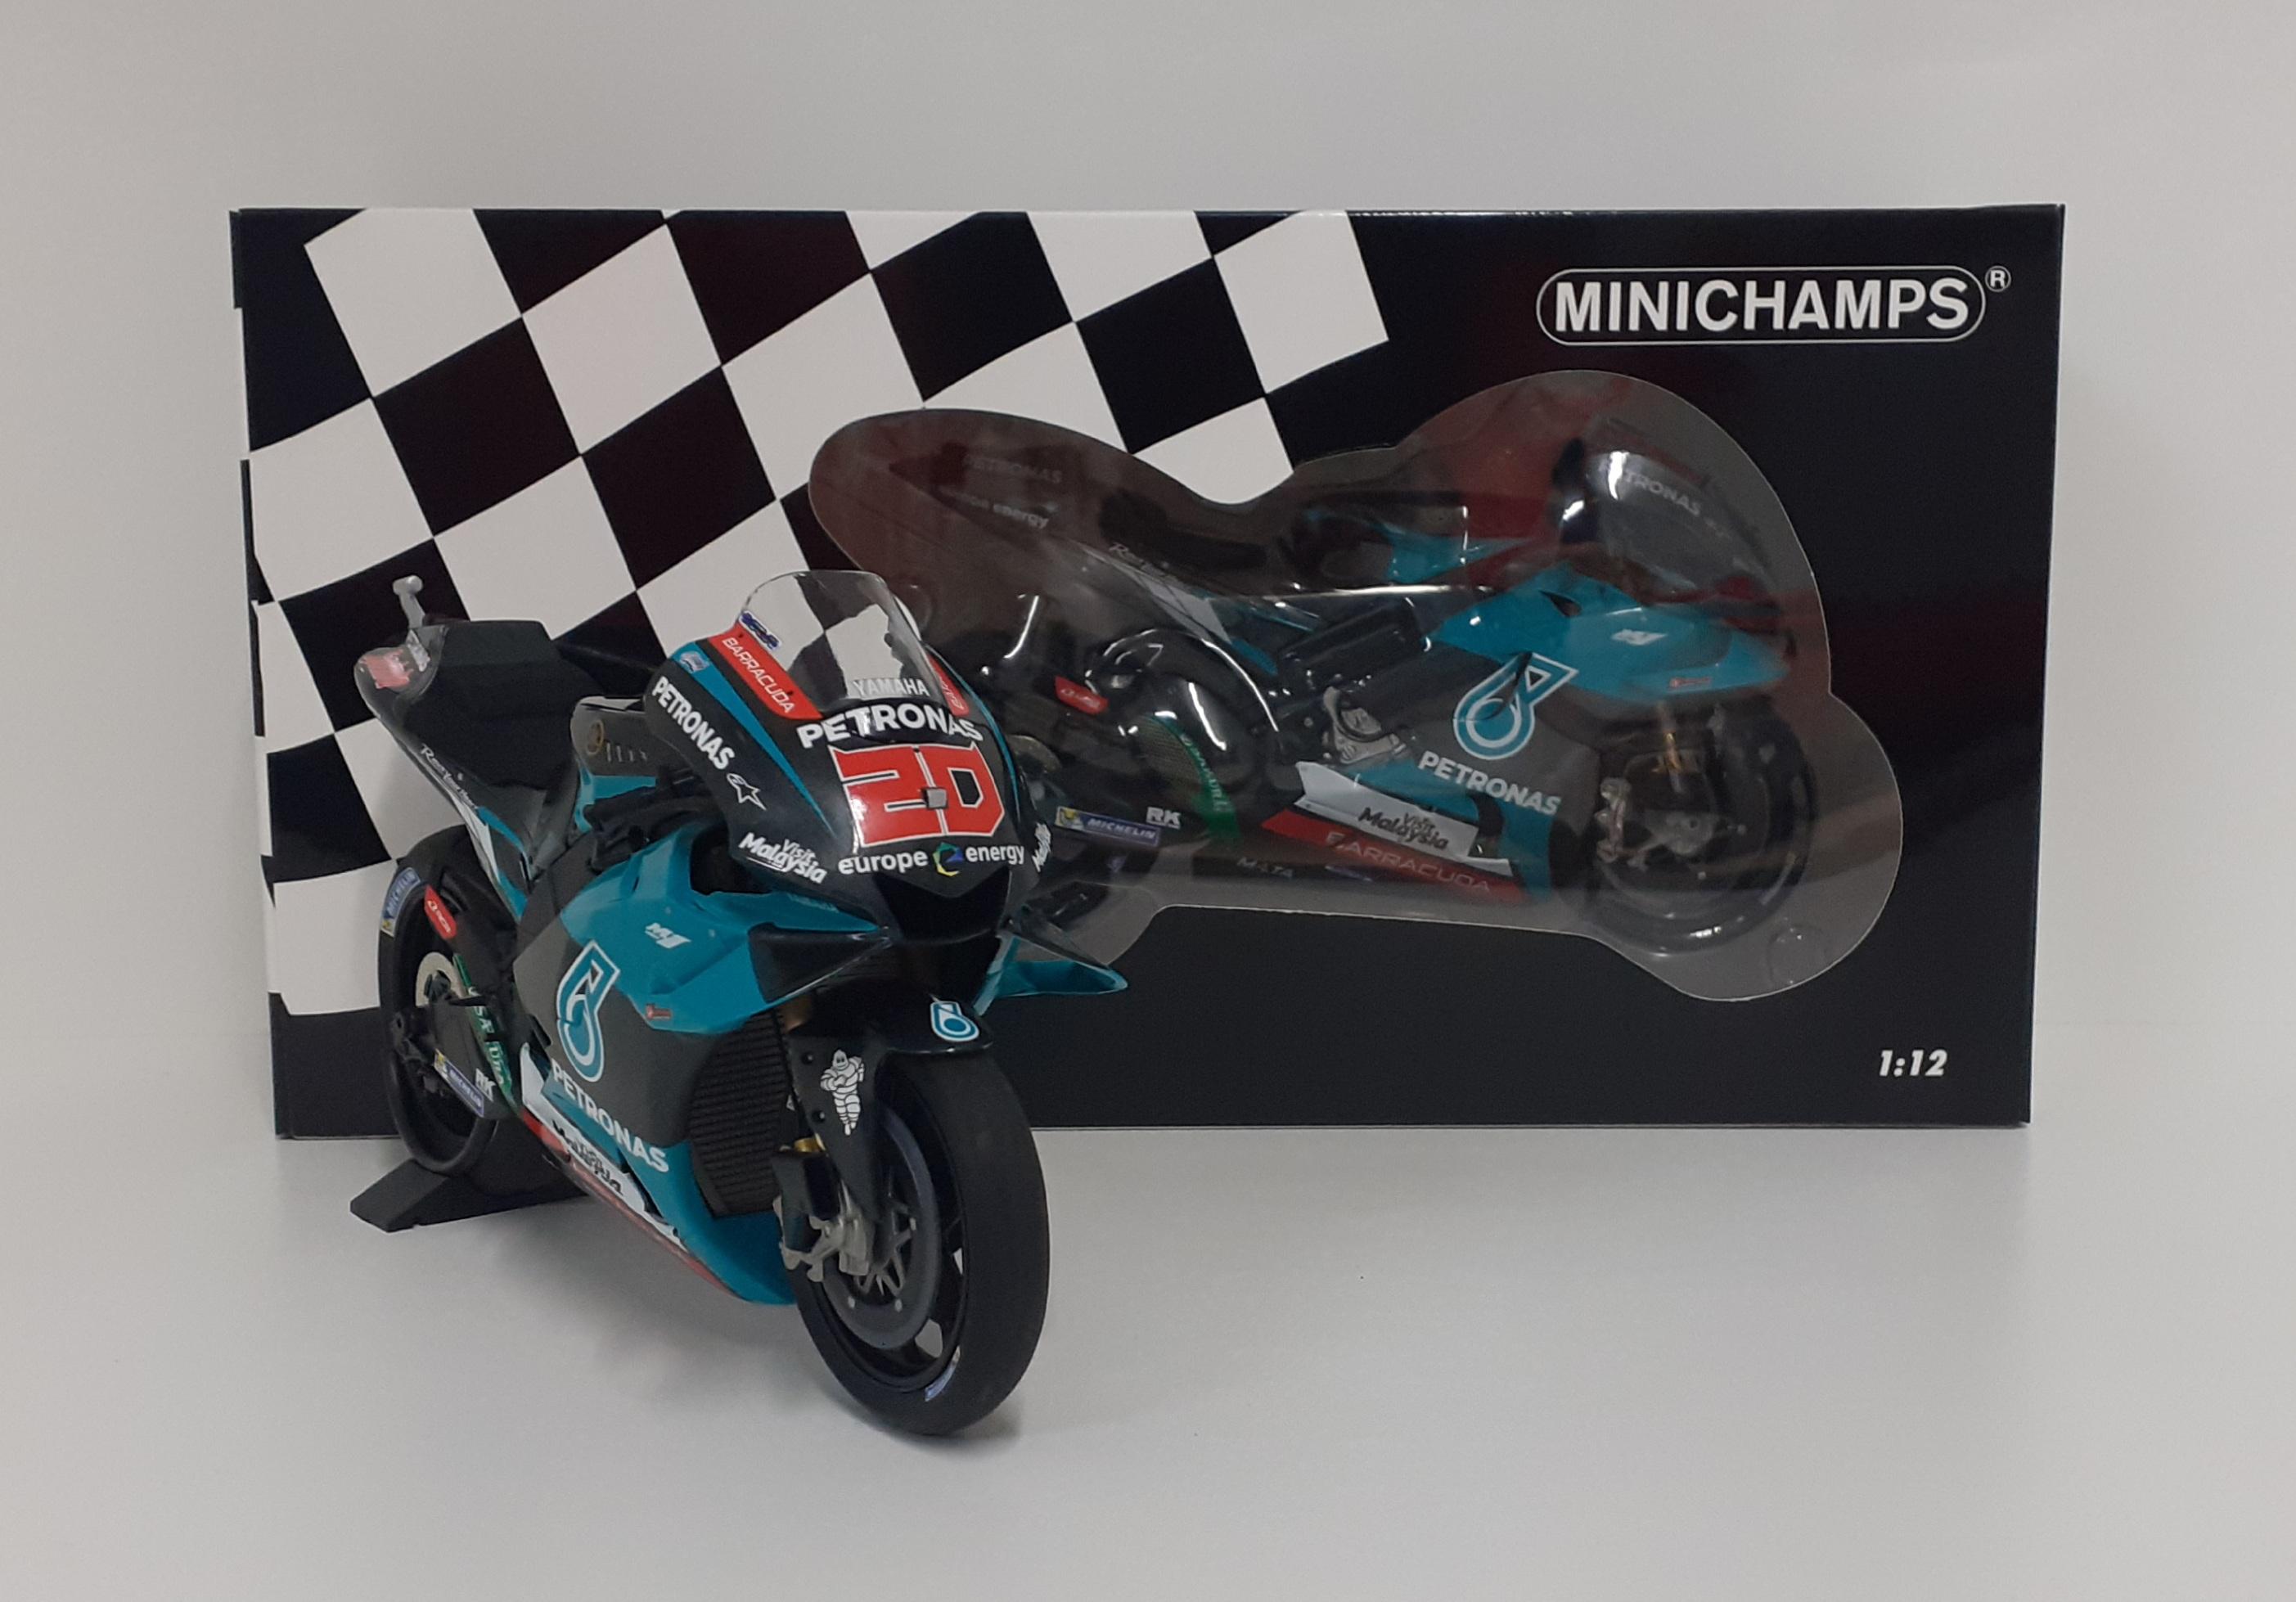 MINICHAMPS 1/12 MODELLINO MOTO YAMAHA M1 PETRONAS QUARTARARO MOTOGP 2019 DIECAST